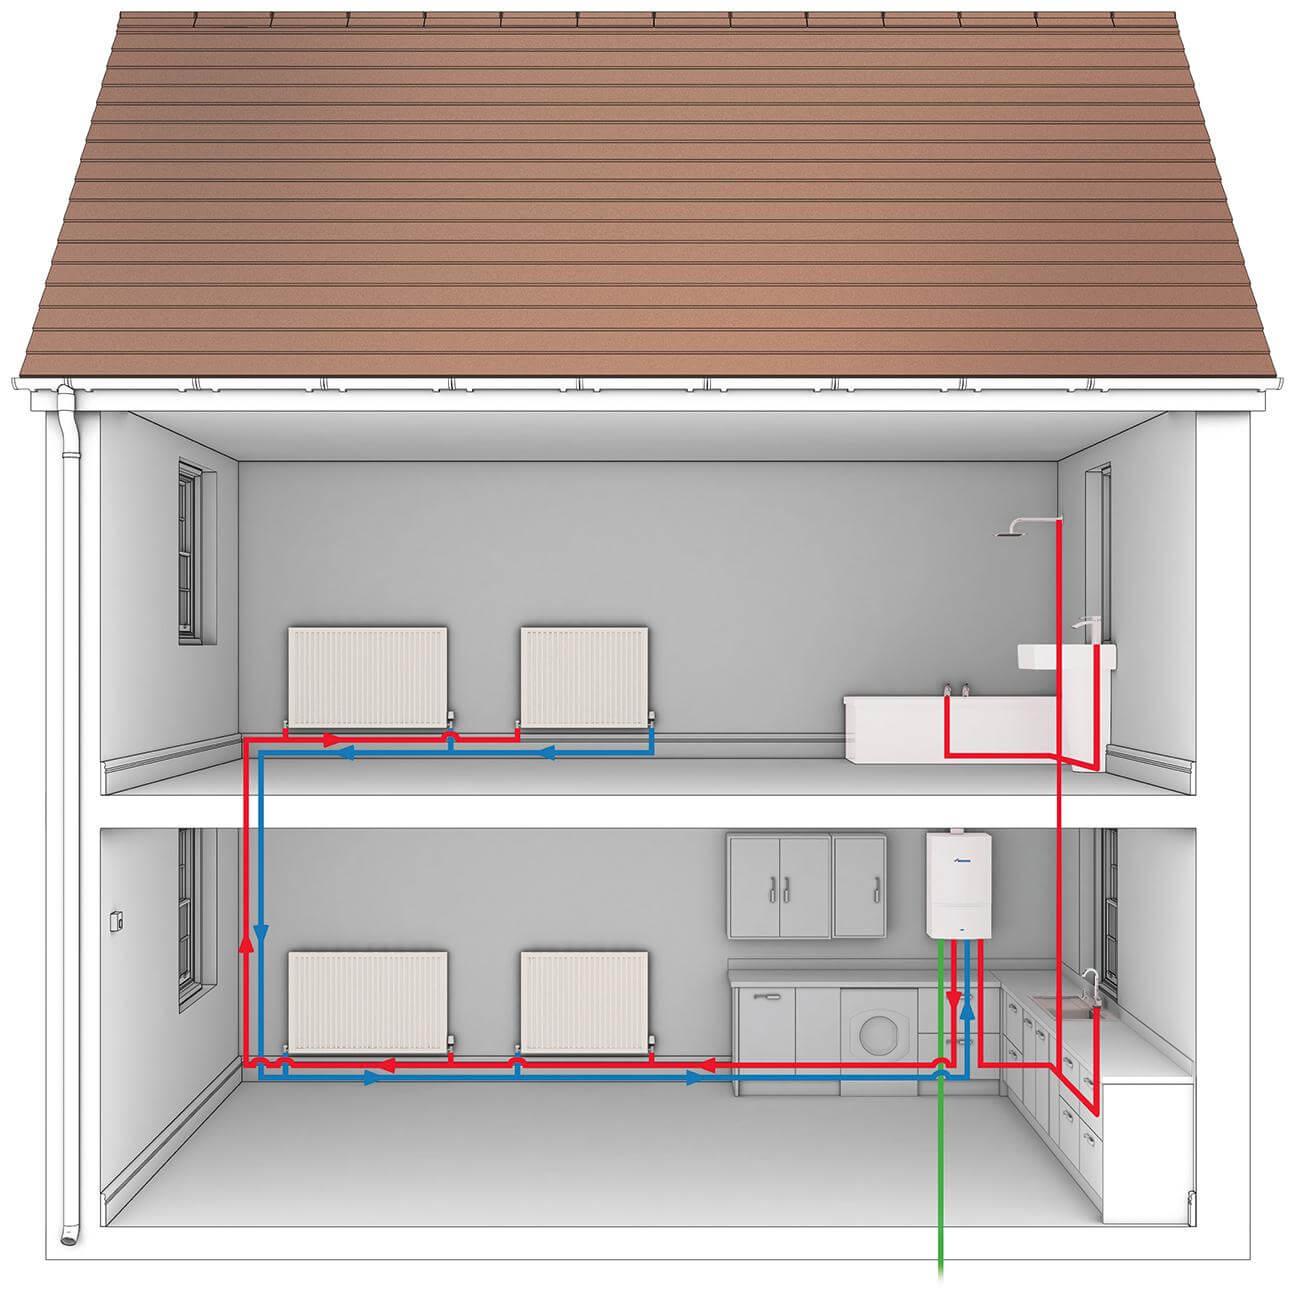 Central Heating, Plumbing & Boiler Installation